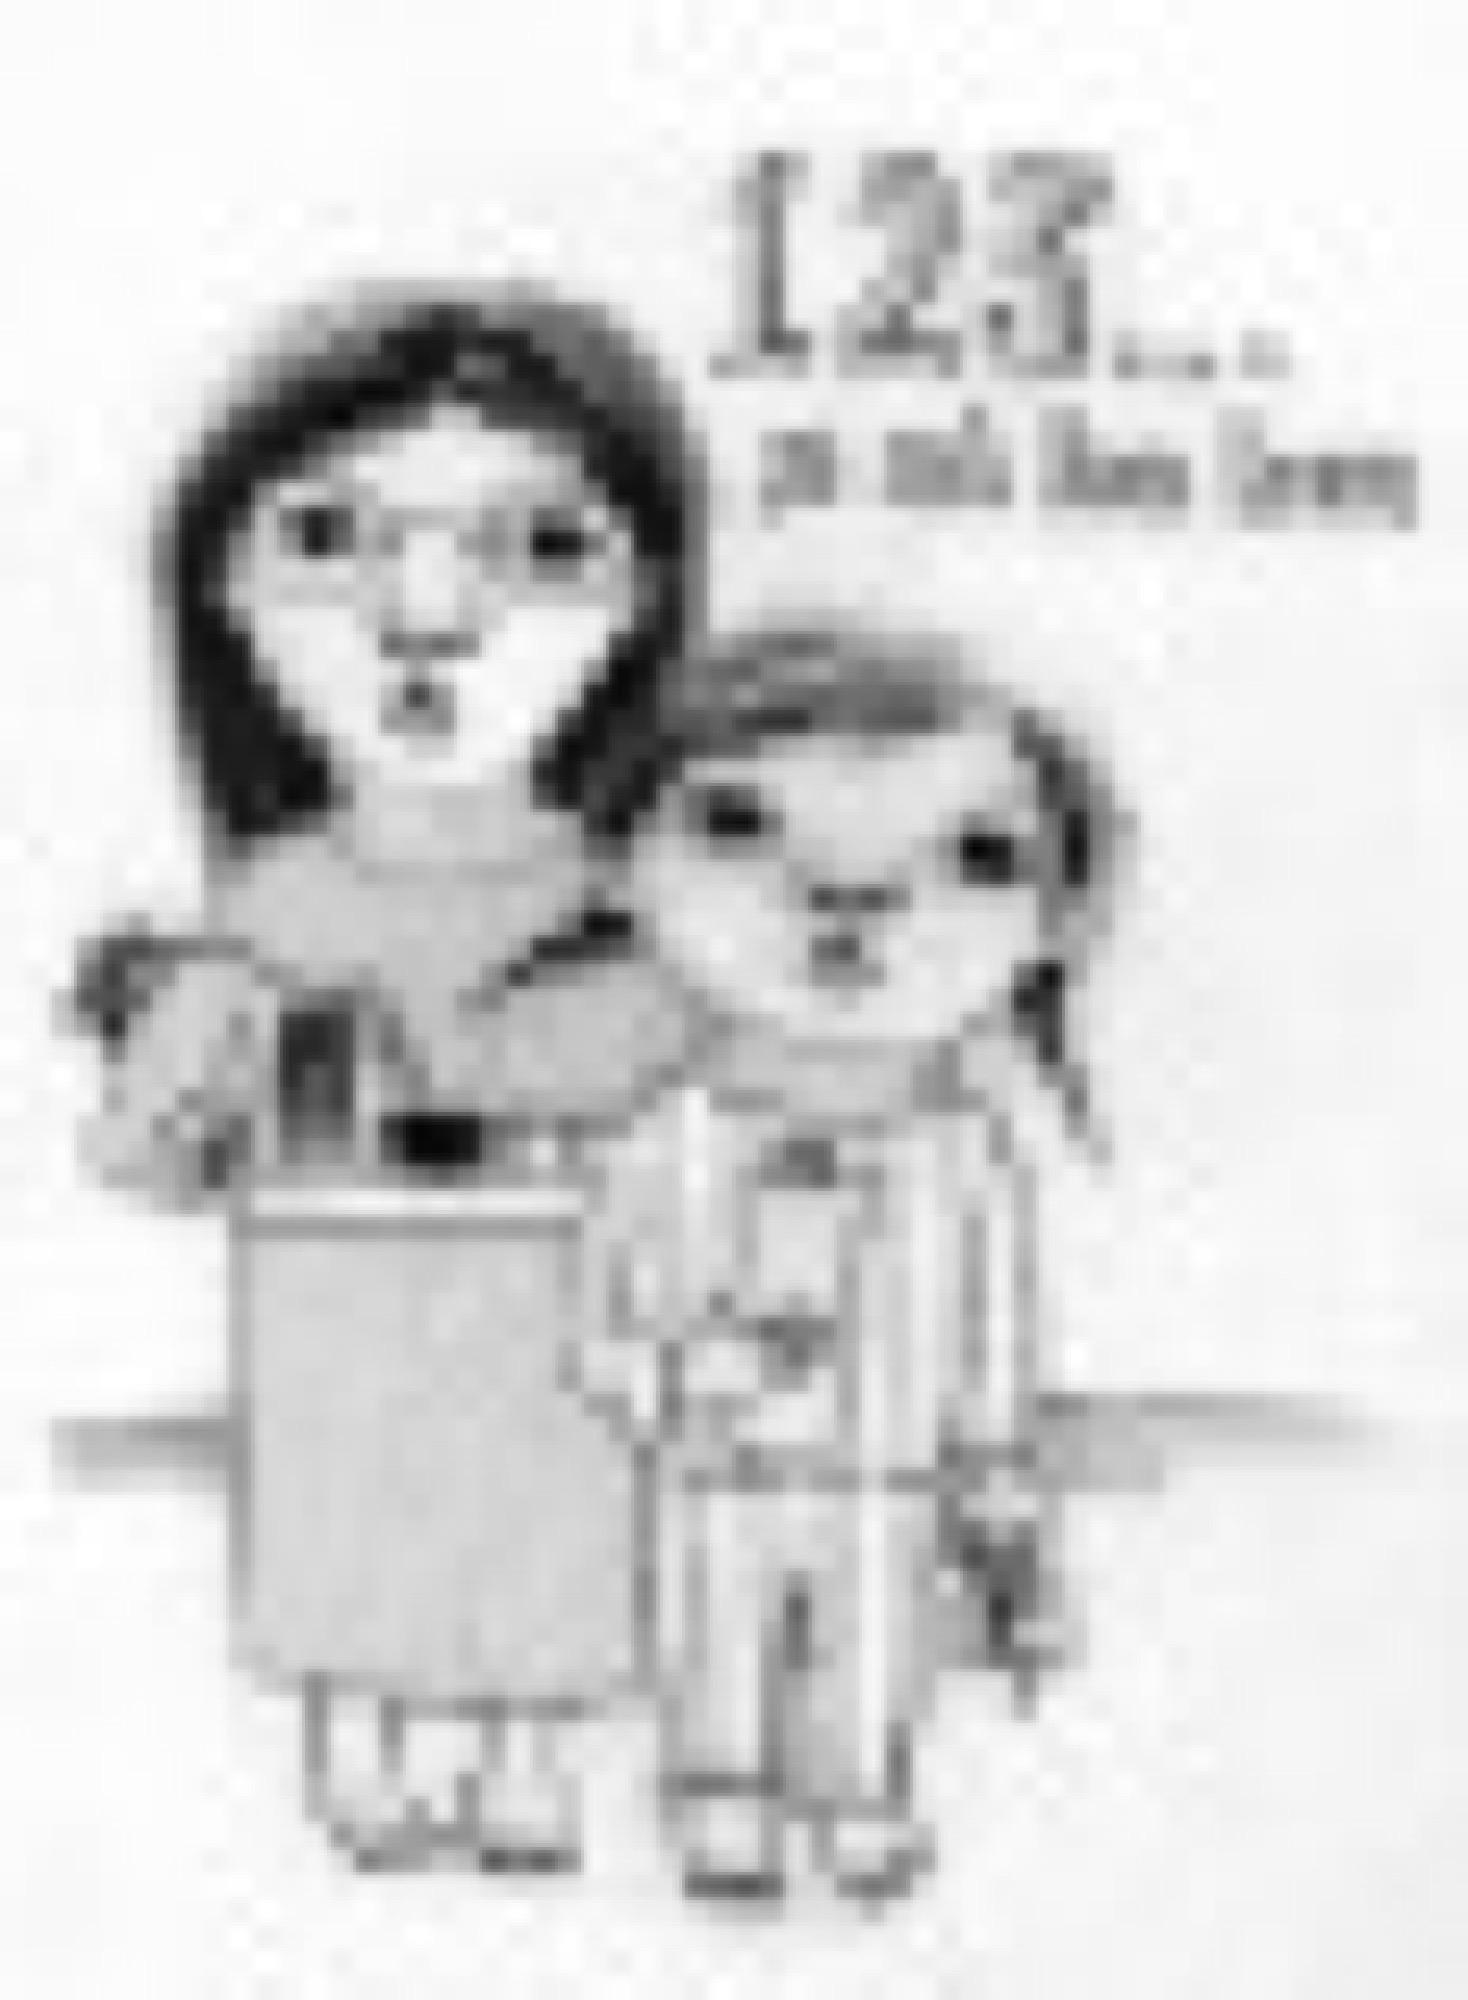 Födelsedagsmamman, childrensbook 2003.